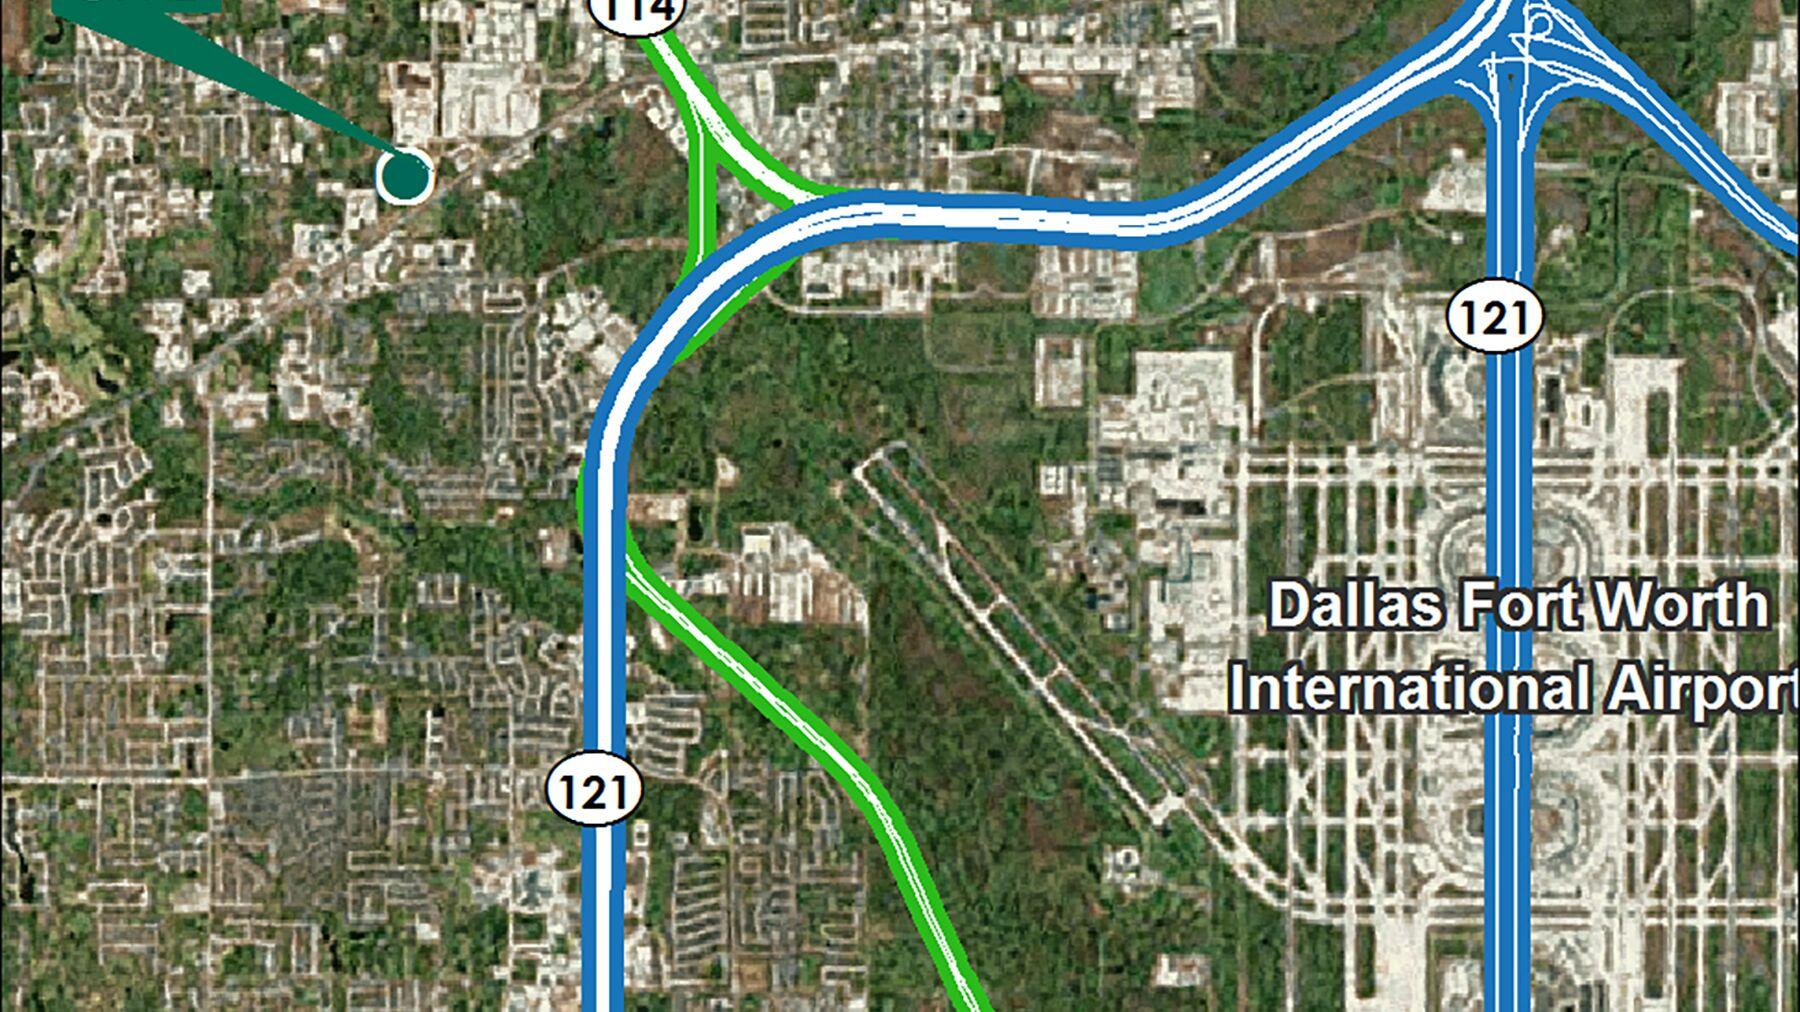 DPM-Prologis-Heritage-Business-Park-8-DAL10508-1080-S-Kimball-Avenue_AerialMap.jpg